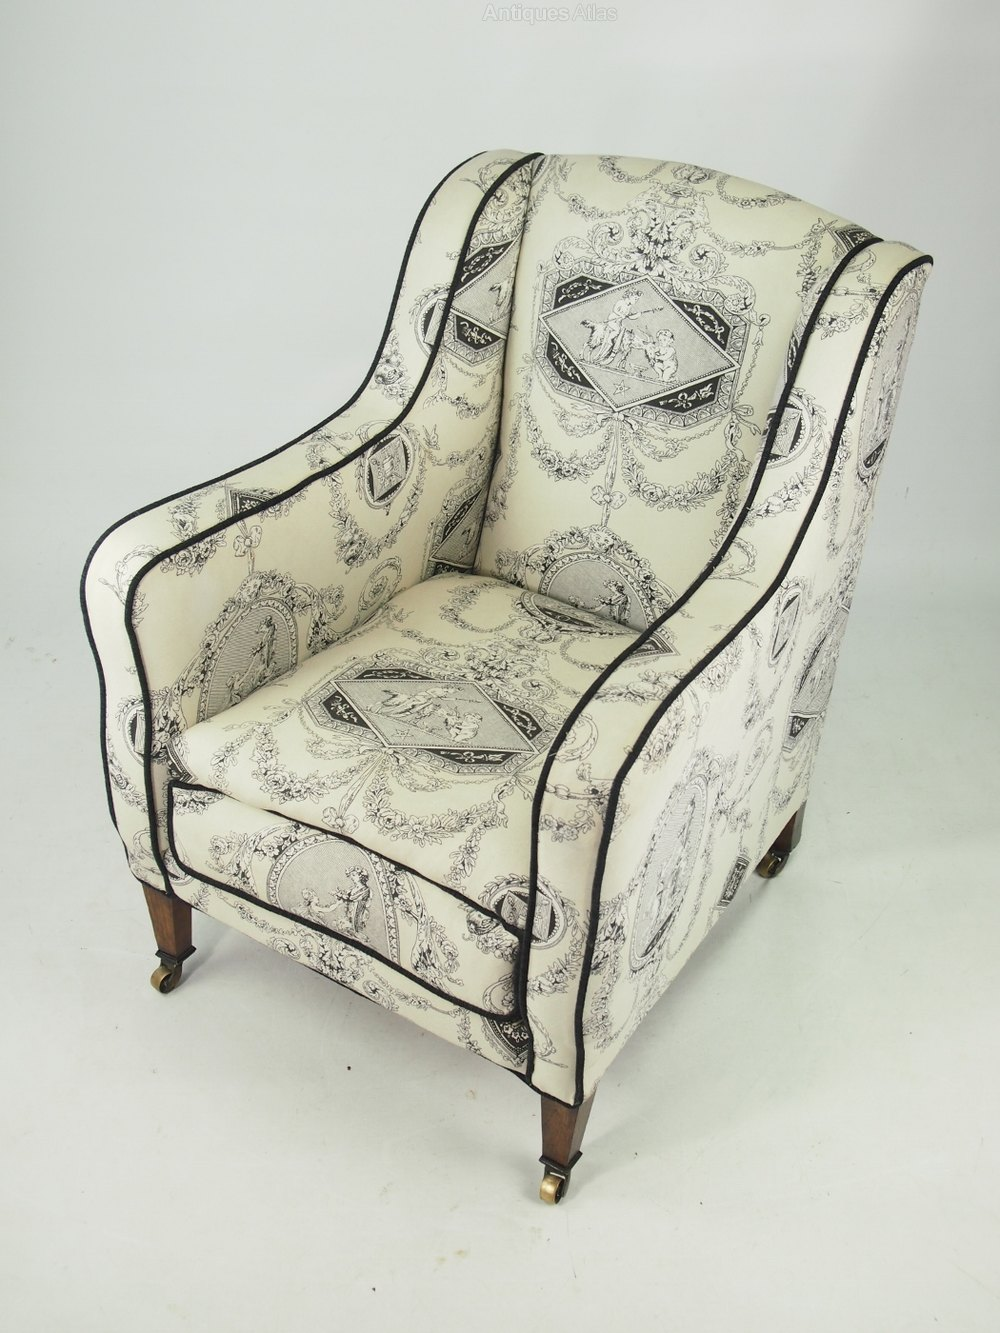 Edwardian Armchair In Laura Ashley Fabric - Antiques Atlas